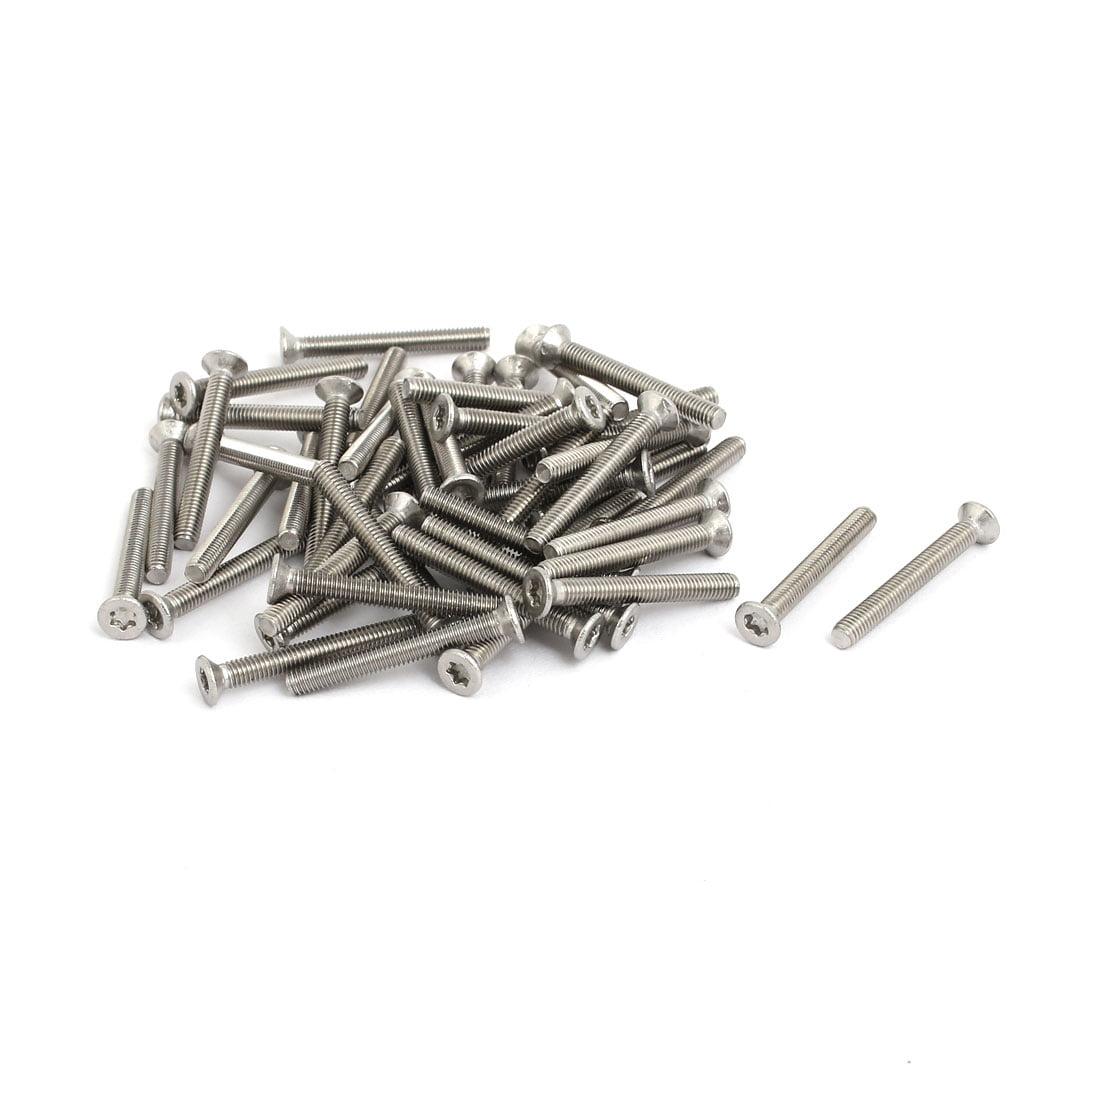 M3x25mm 304 Stainless Steel Flat Head Torx Drive Type Screw Silver Tone 50pcs - image 3 of 3